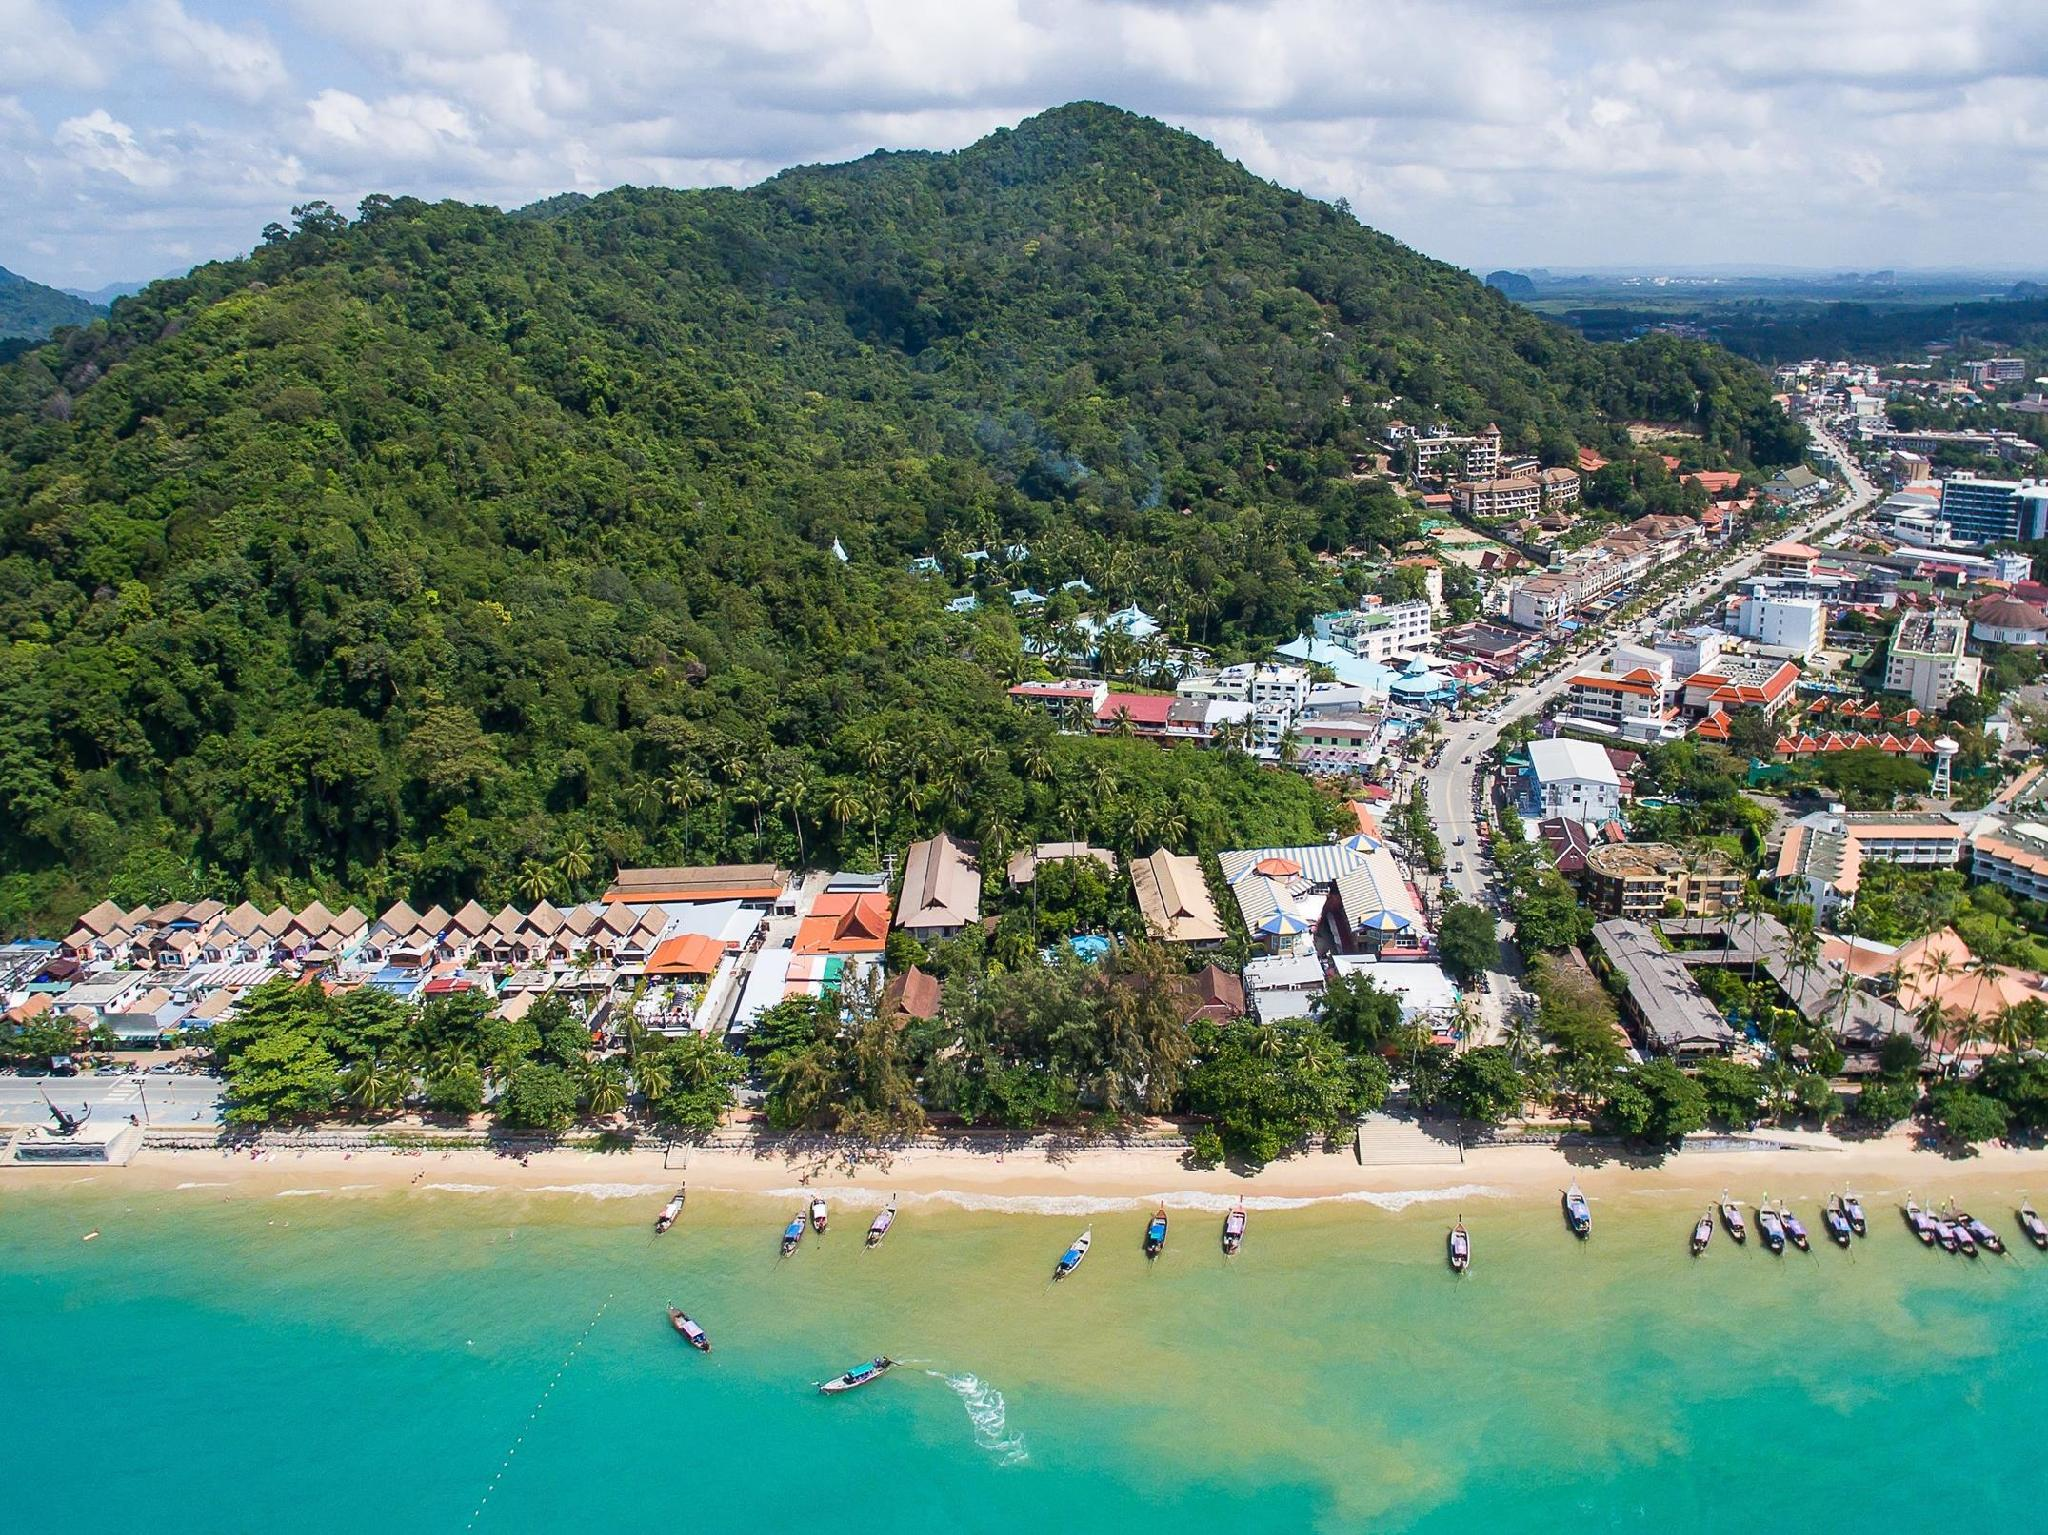 Aonang Princeville Villa Resort and Spa อ่าวนาง ปรินซ์วิลล์ วิลลา รีสอร์ต แอนด์ สปา